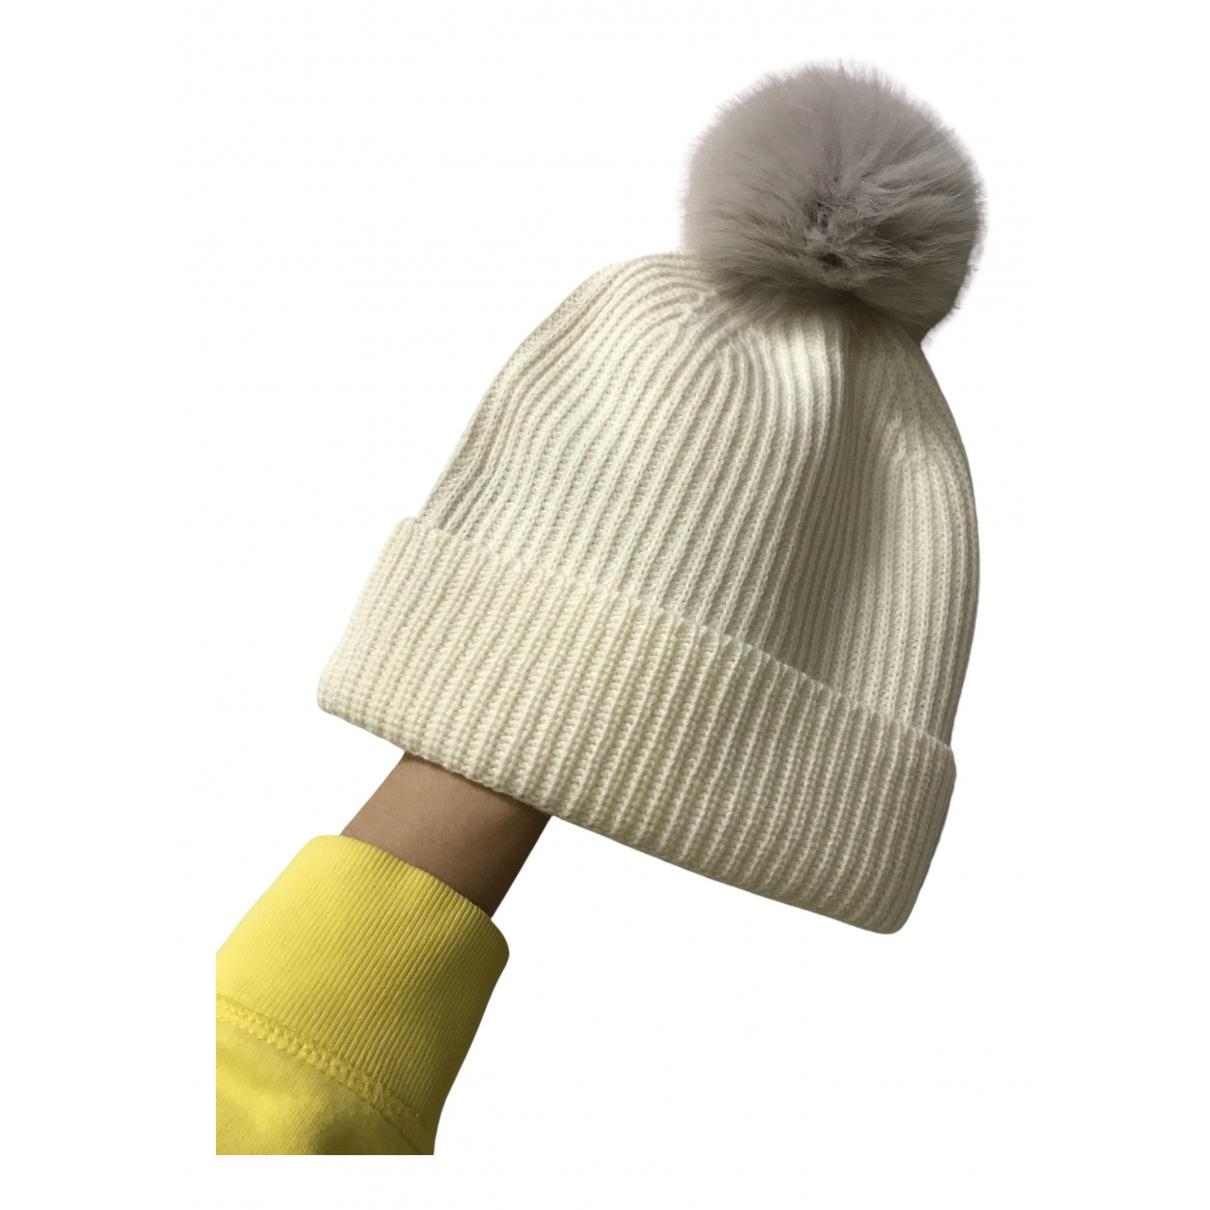 Max Mara N White Wool hat for Women 56 cm